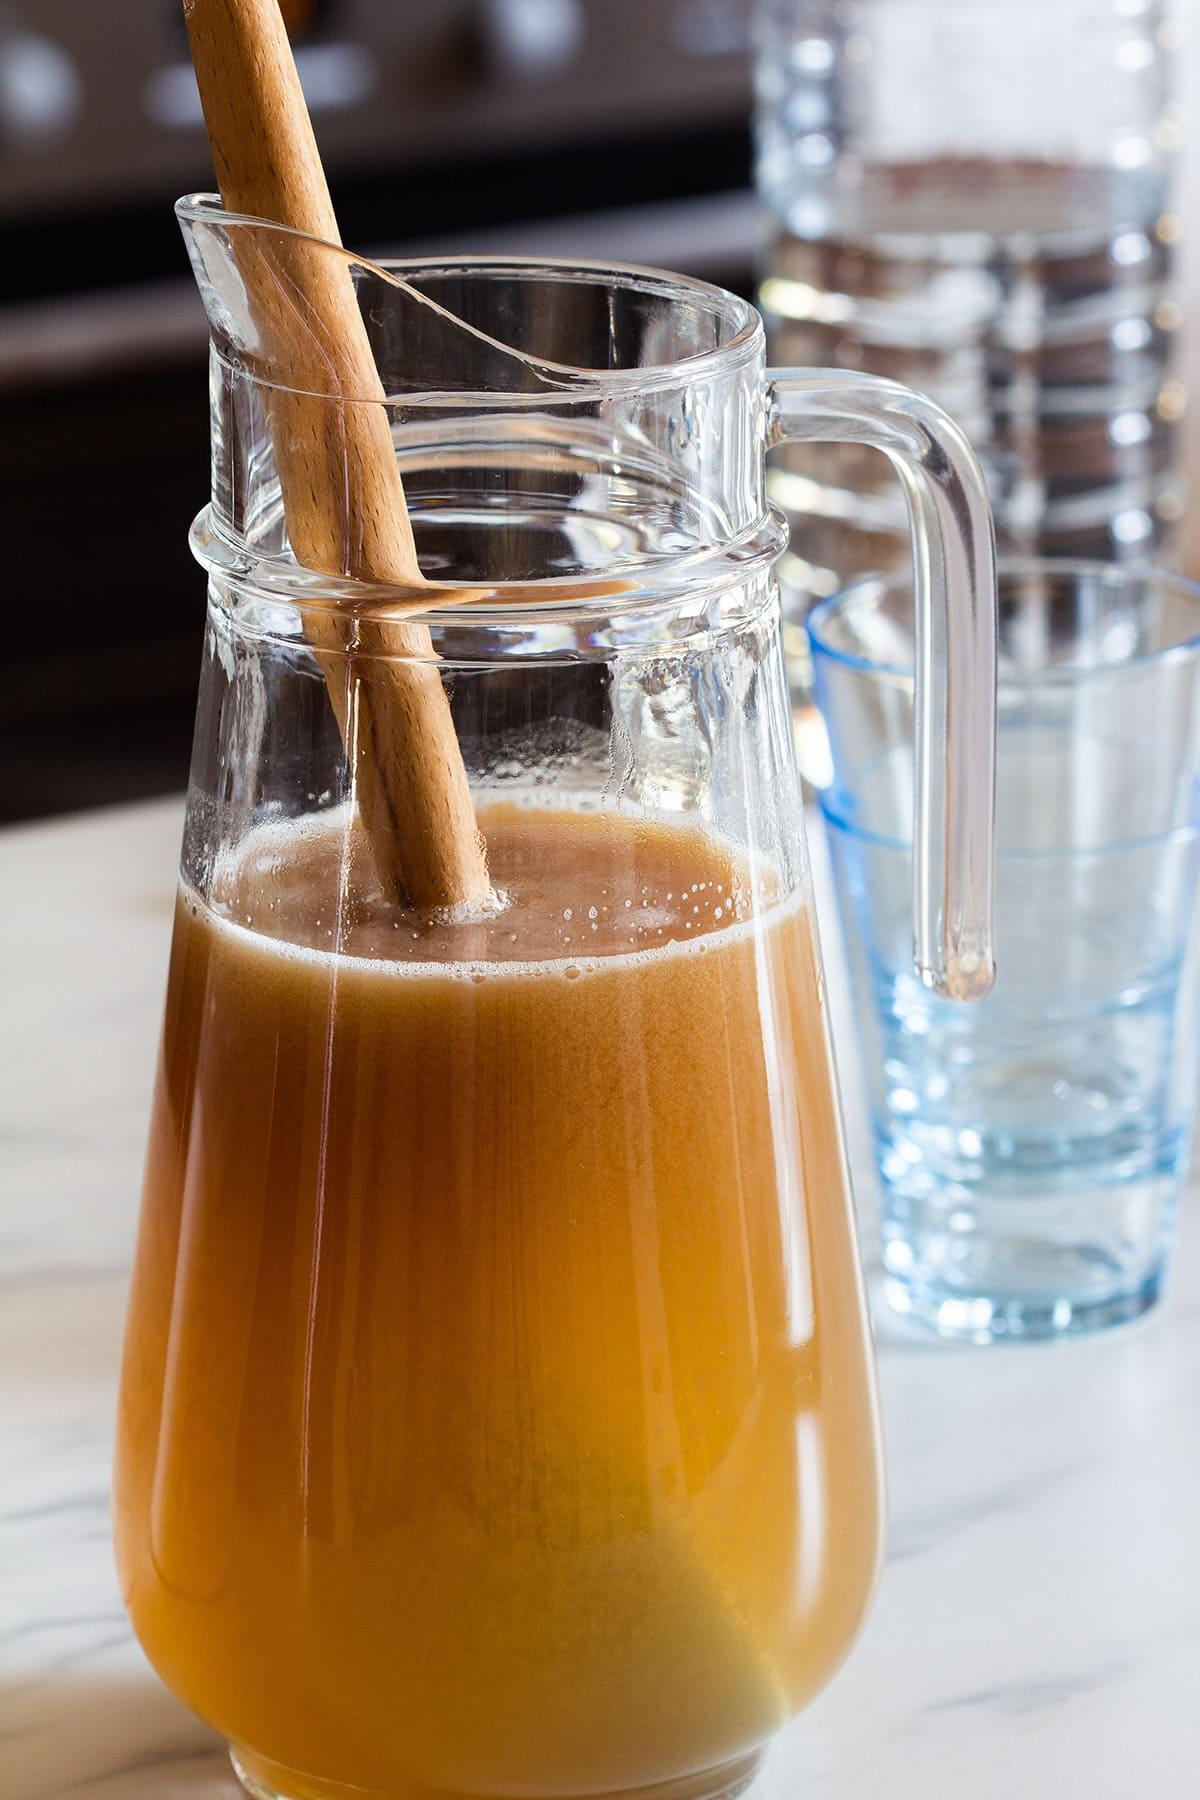 Agua de tamarindo (drink) on a pitcher.